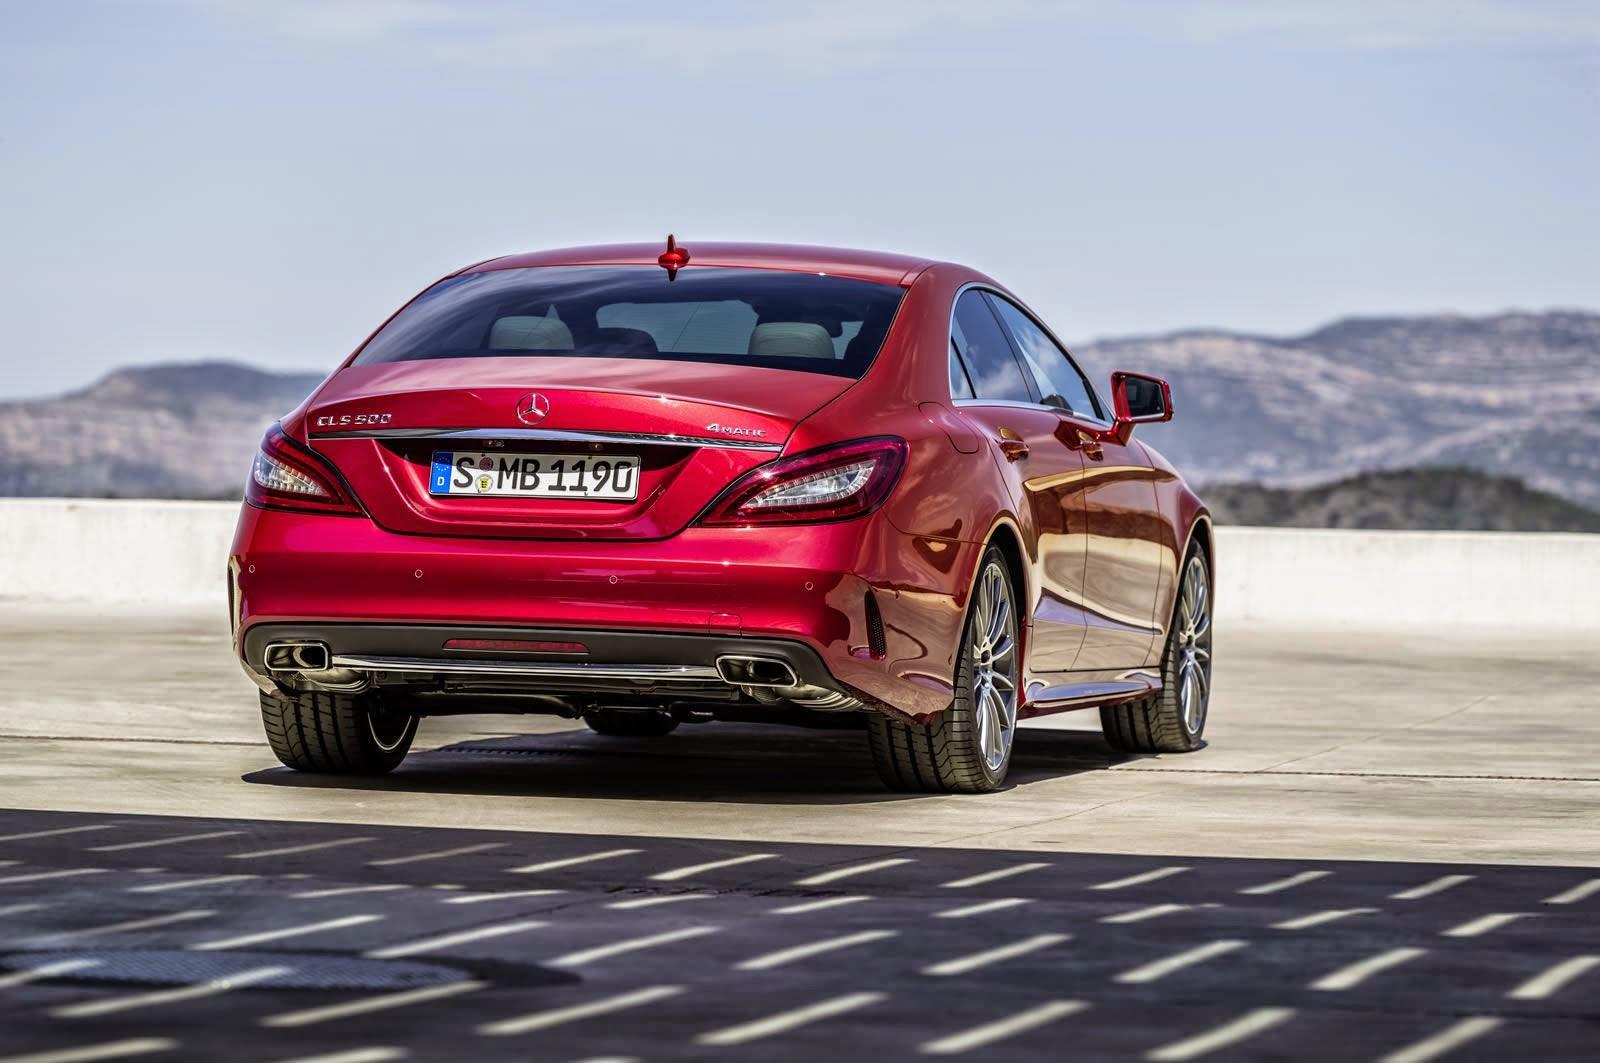 [Resim: Mercedes-Benz+CLS+Serisi+2.jpg]